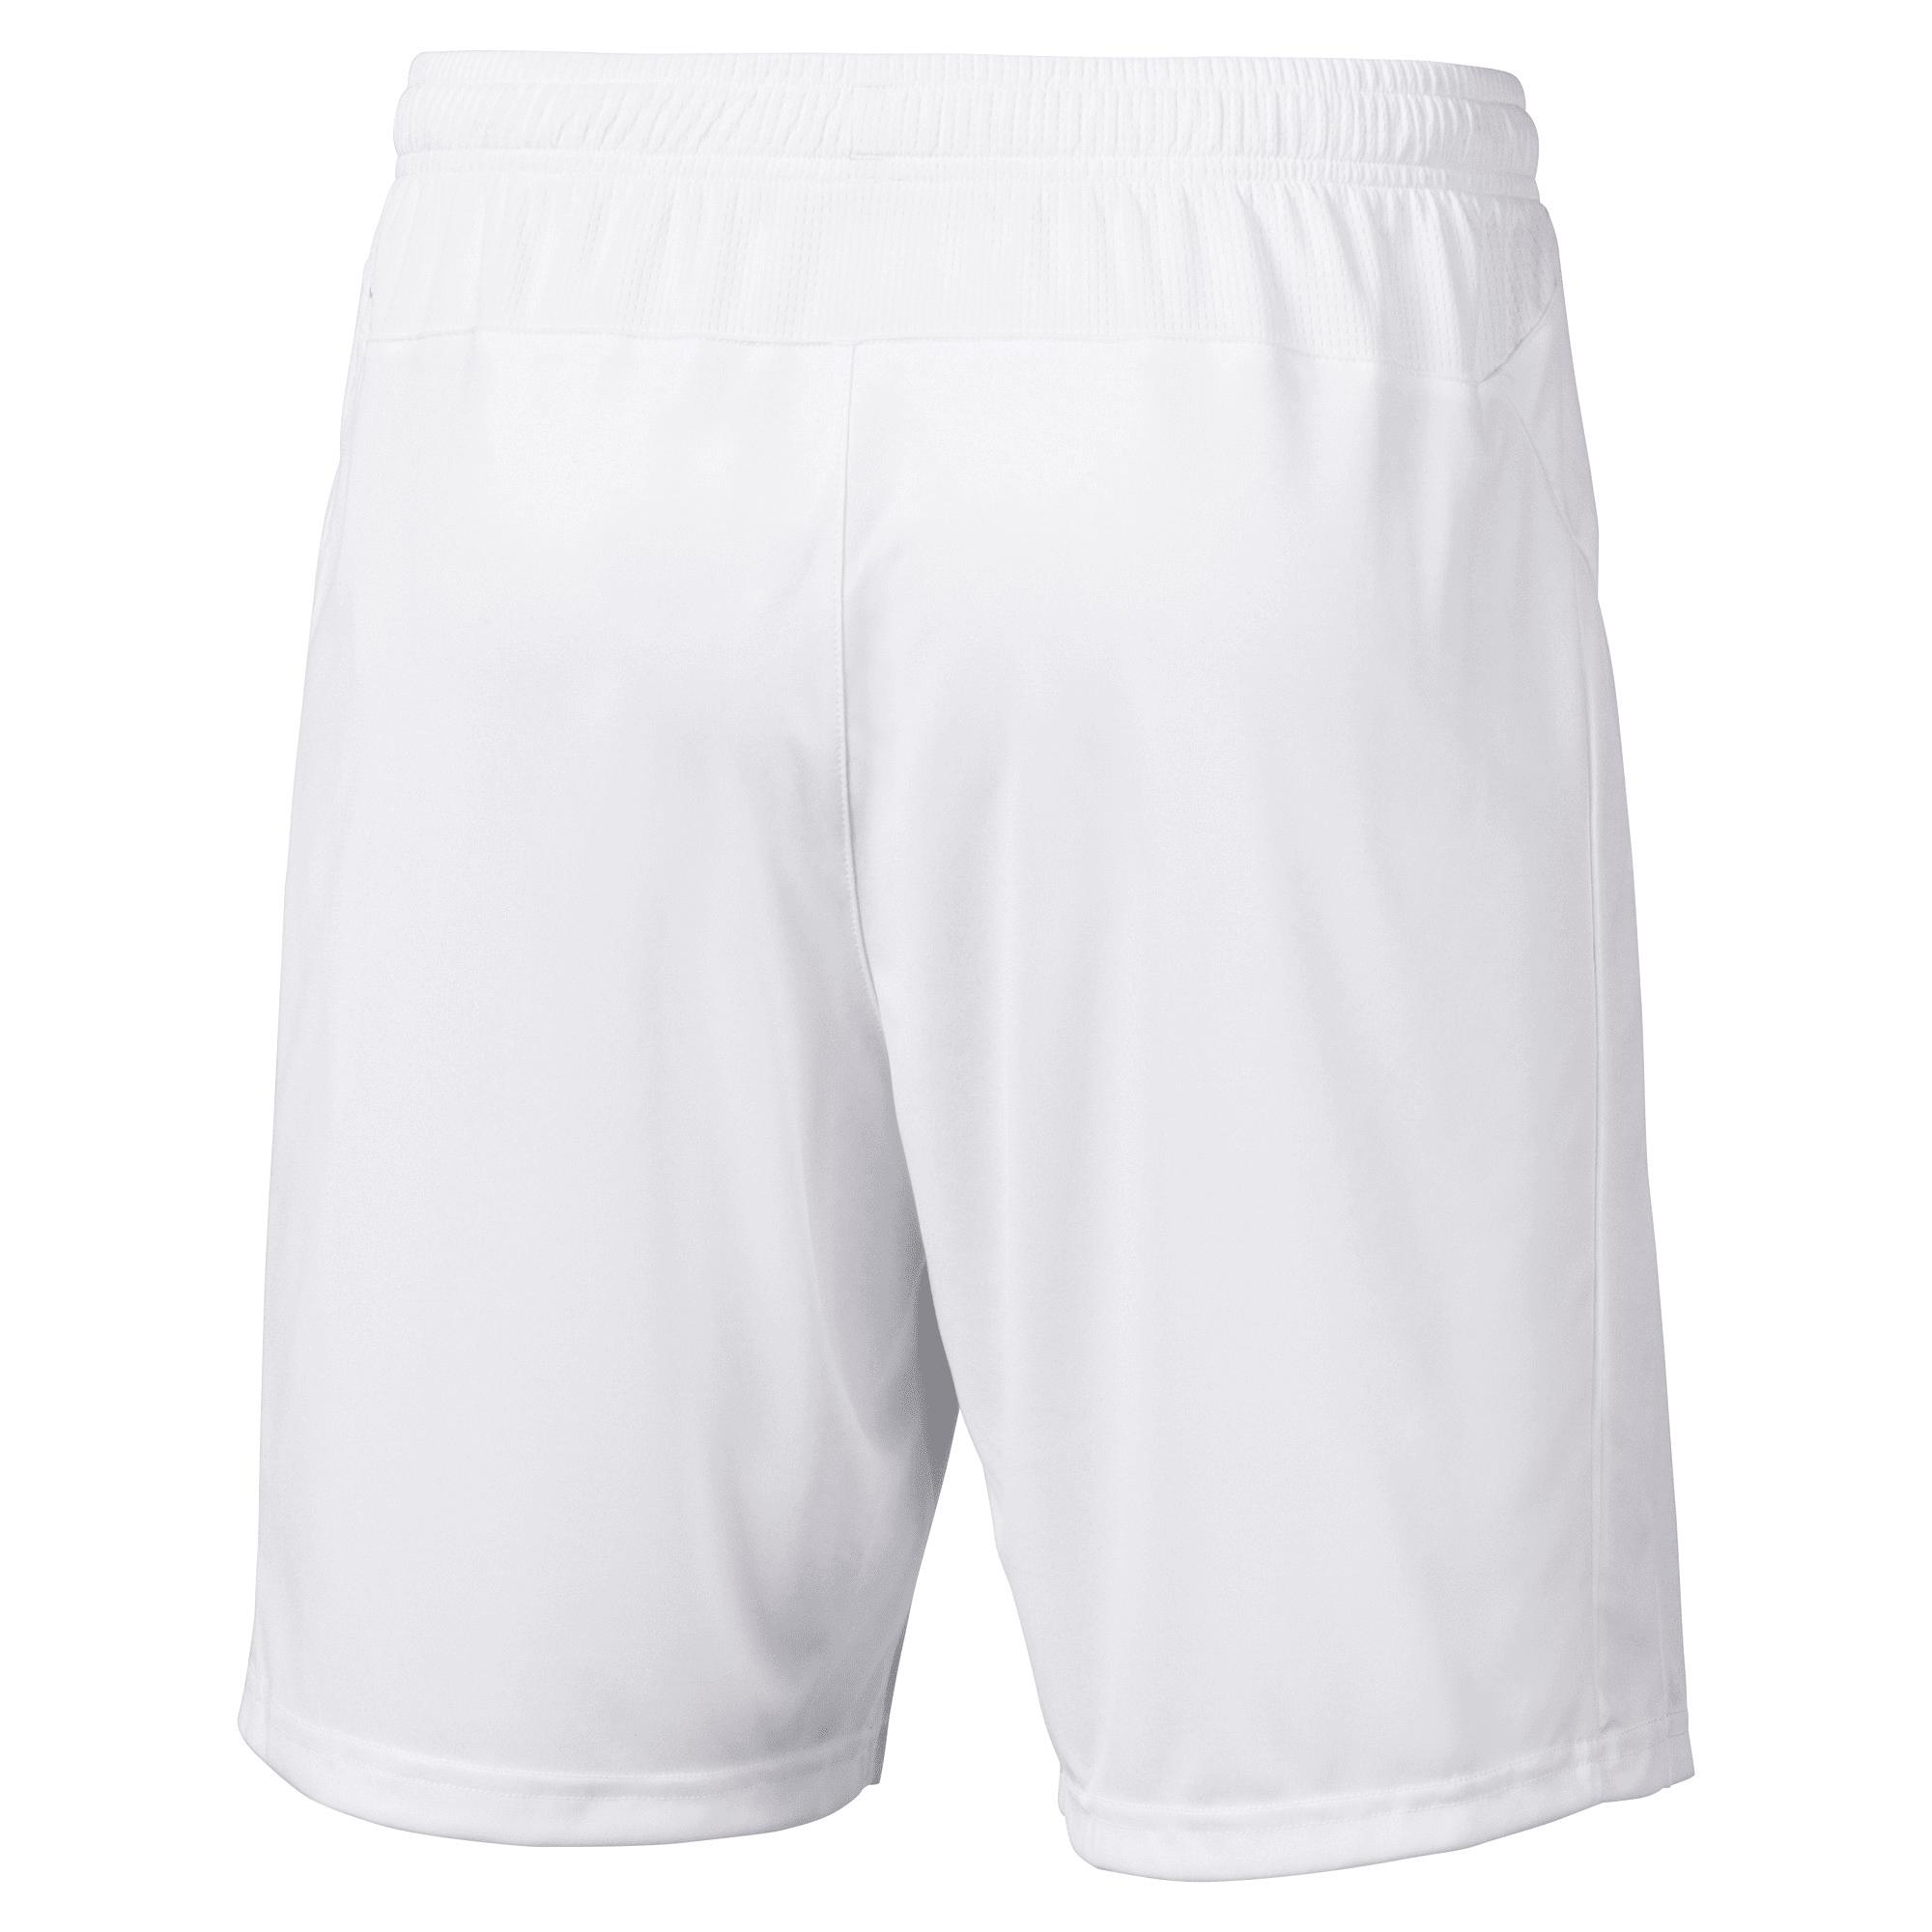 Thumbnail 4 of Liga Men's Shorts, Puma White-Puma Black, medium